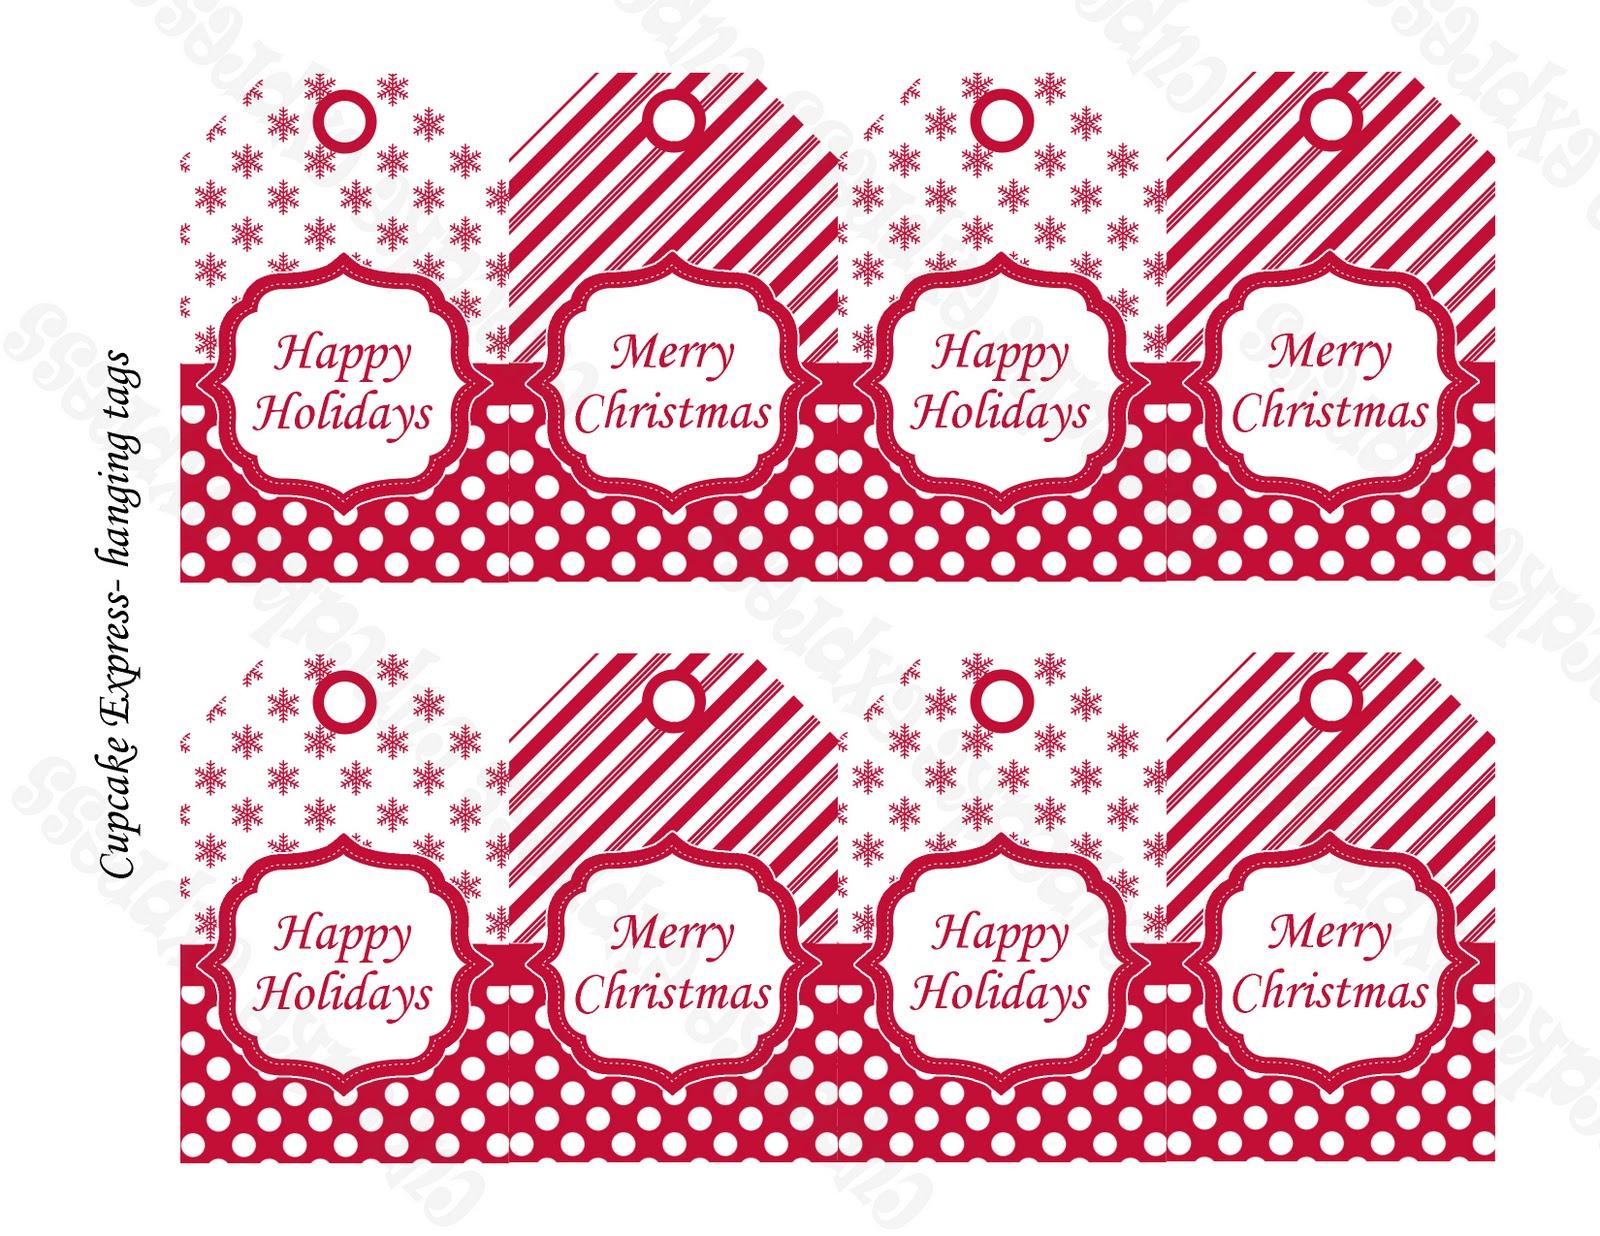 Free Printable Peppermint Christmas Tags